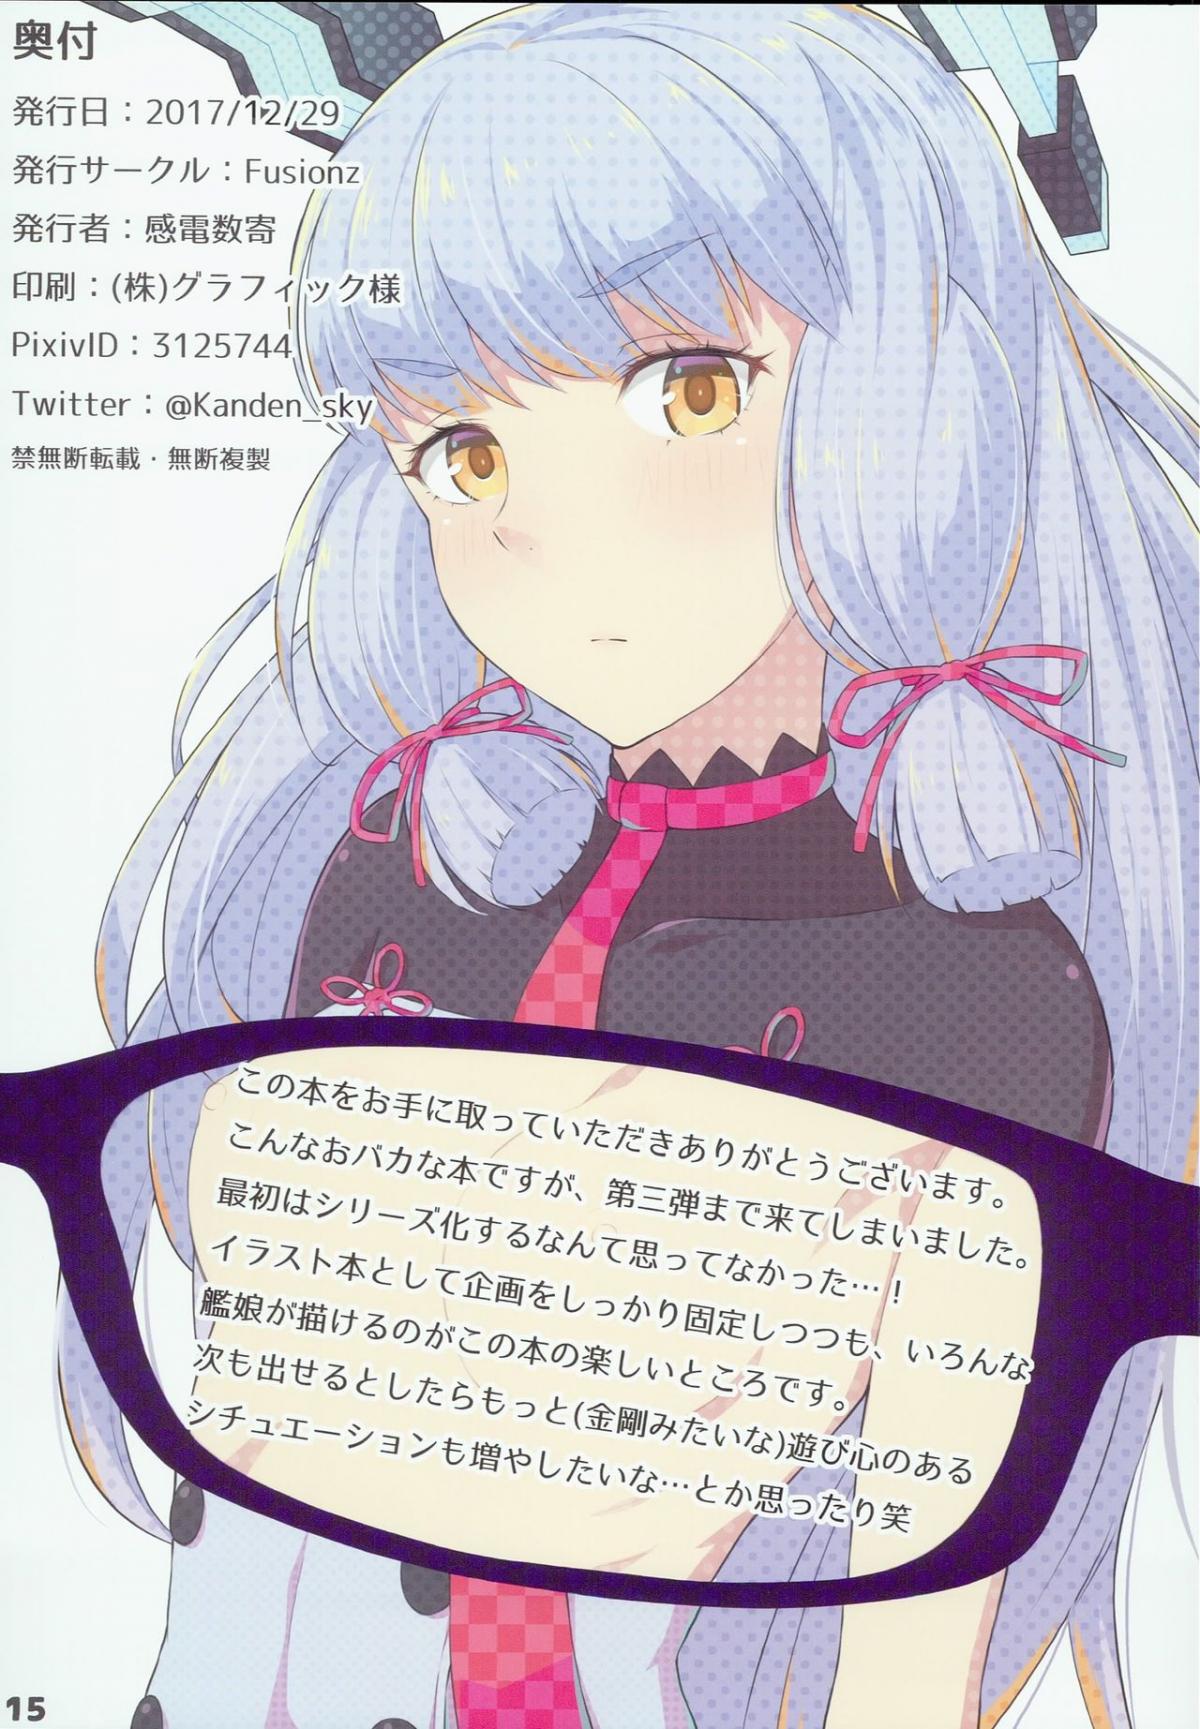 HentaiVN.net - Ảnh 16 - Kanmusu No Kyoubu Soukou Ga Sukeru Megane (Kantai Collection) - Chap 3